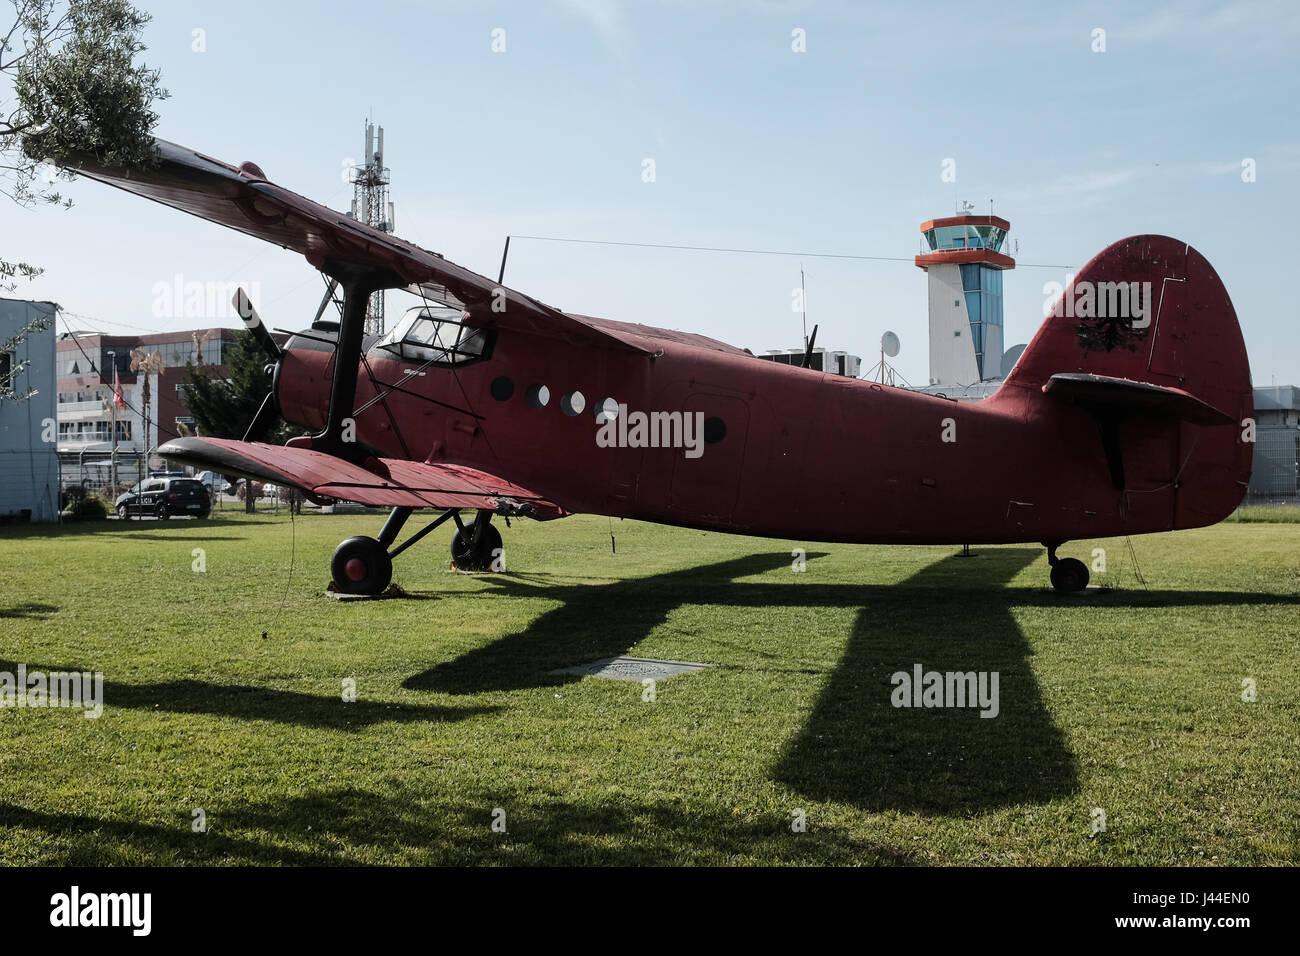 An Antonov AN-2 biplane on display at Tirana International Airport Nënë Tereza (Mother Teresa). Also known - Stock Image